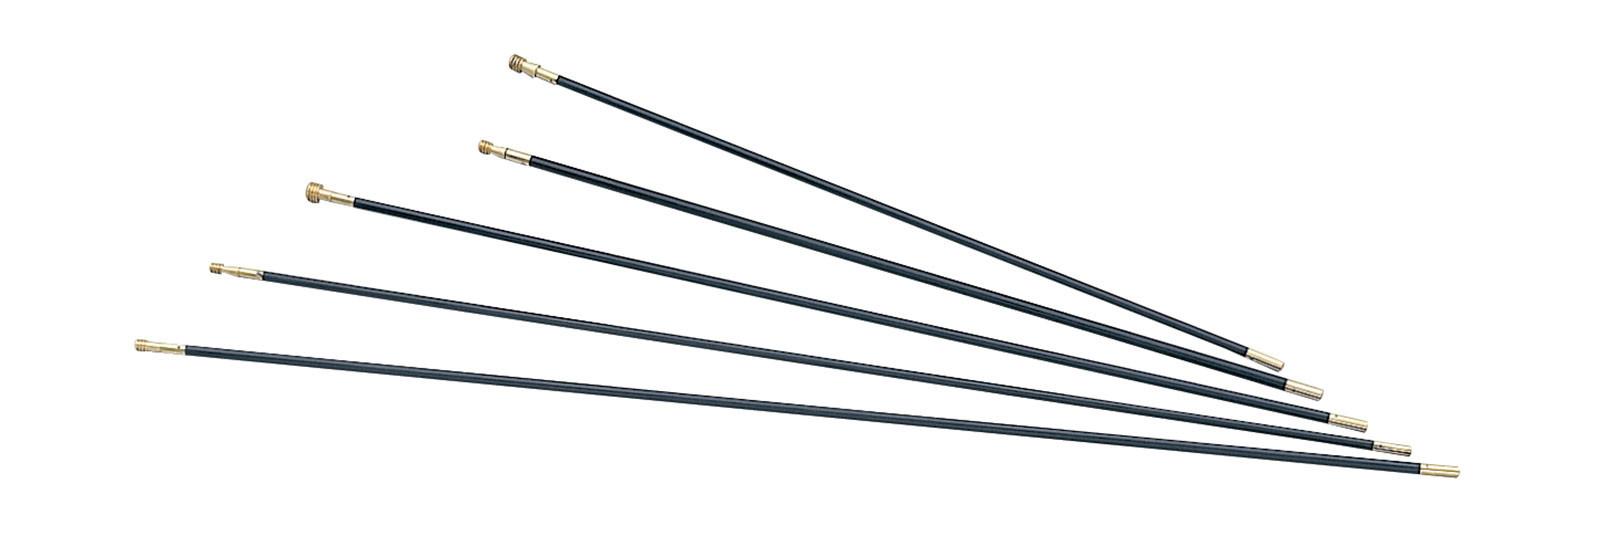 Bacchetta/fiber rod 9x695 mm